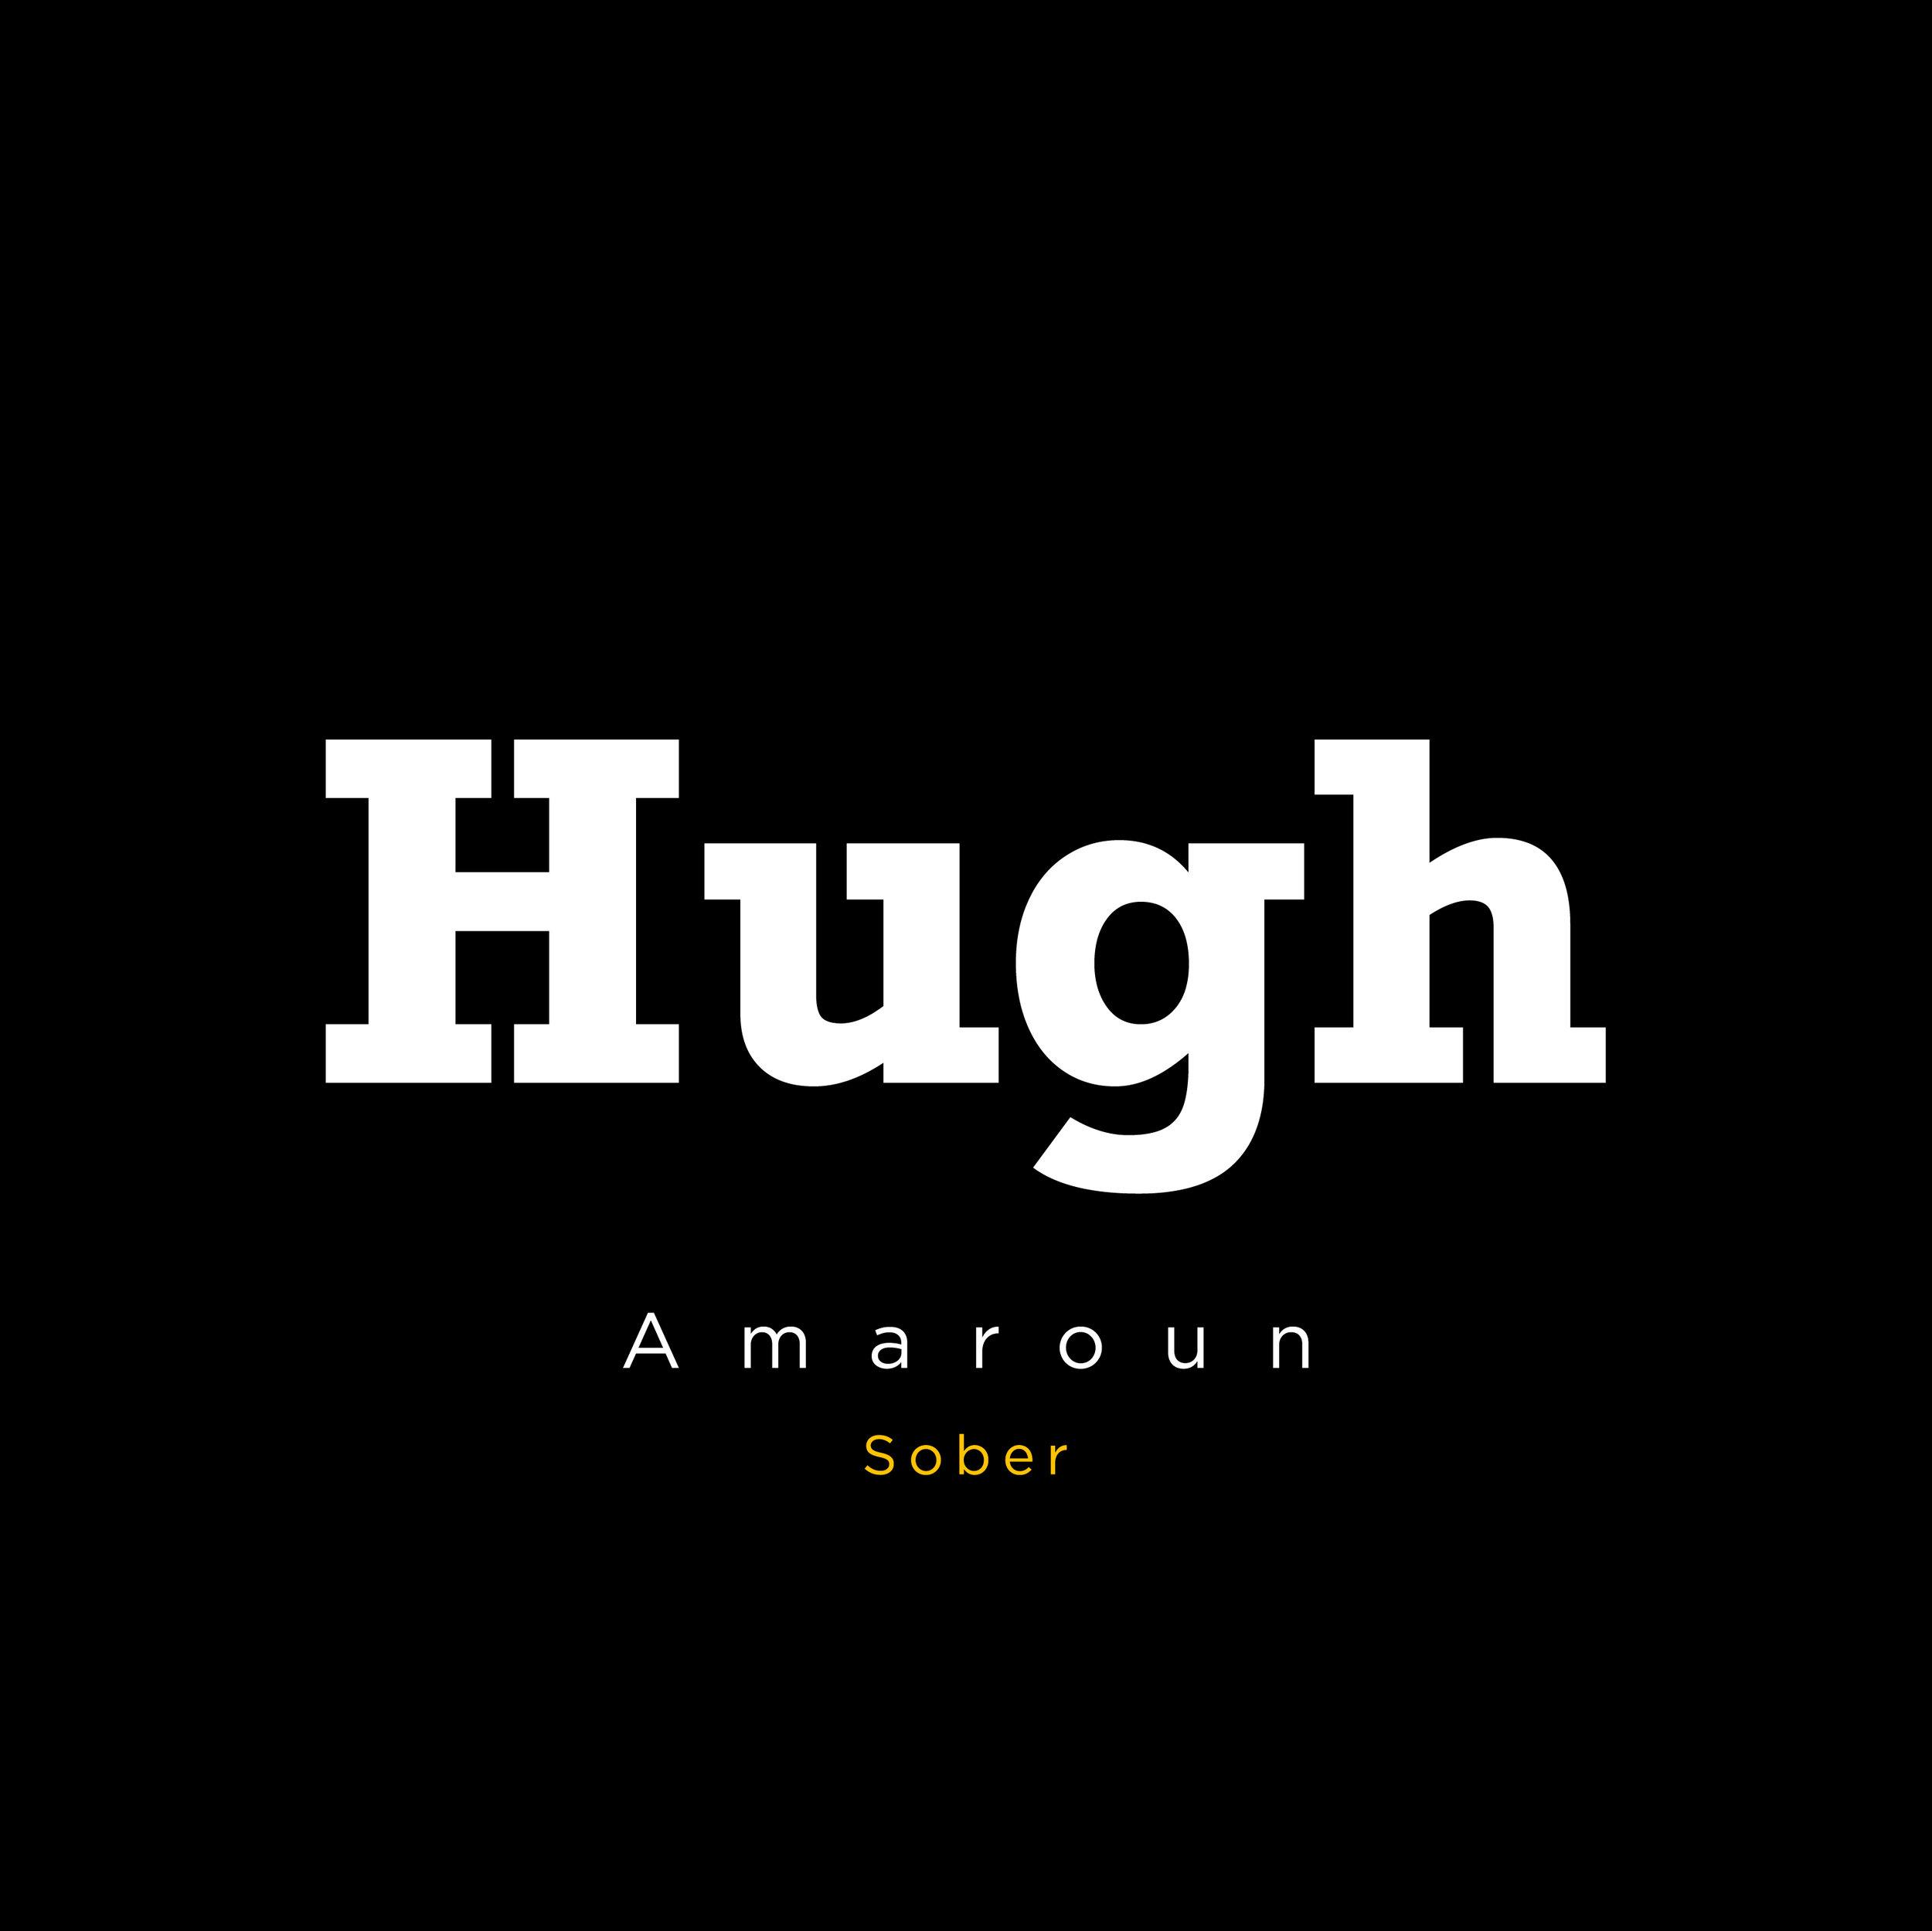 Hugh-01.jpg